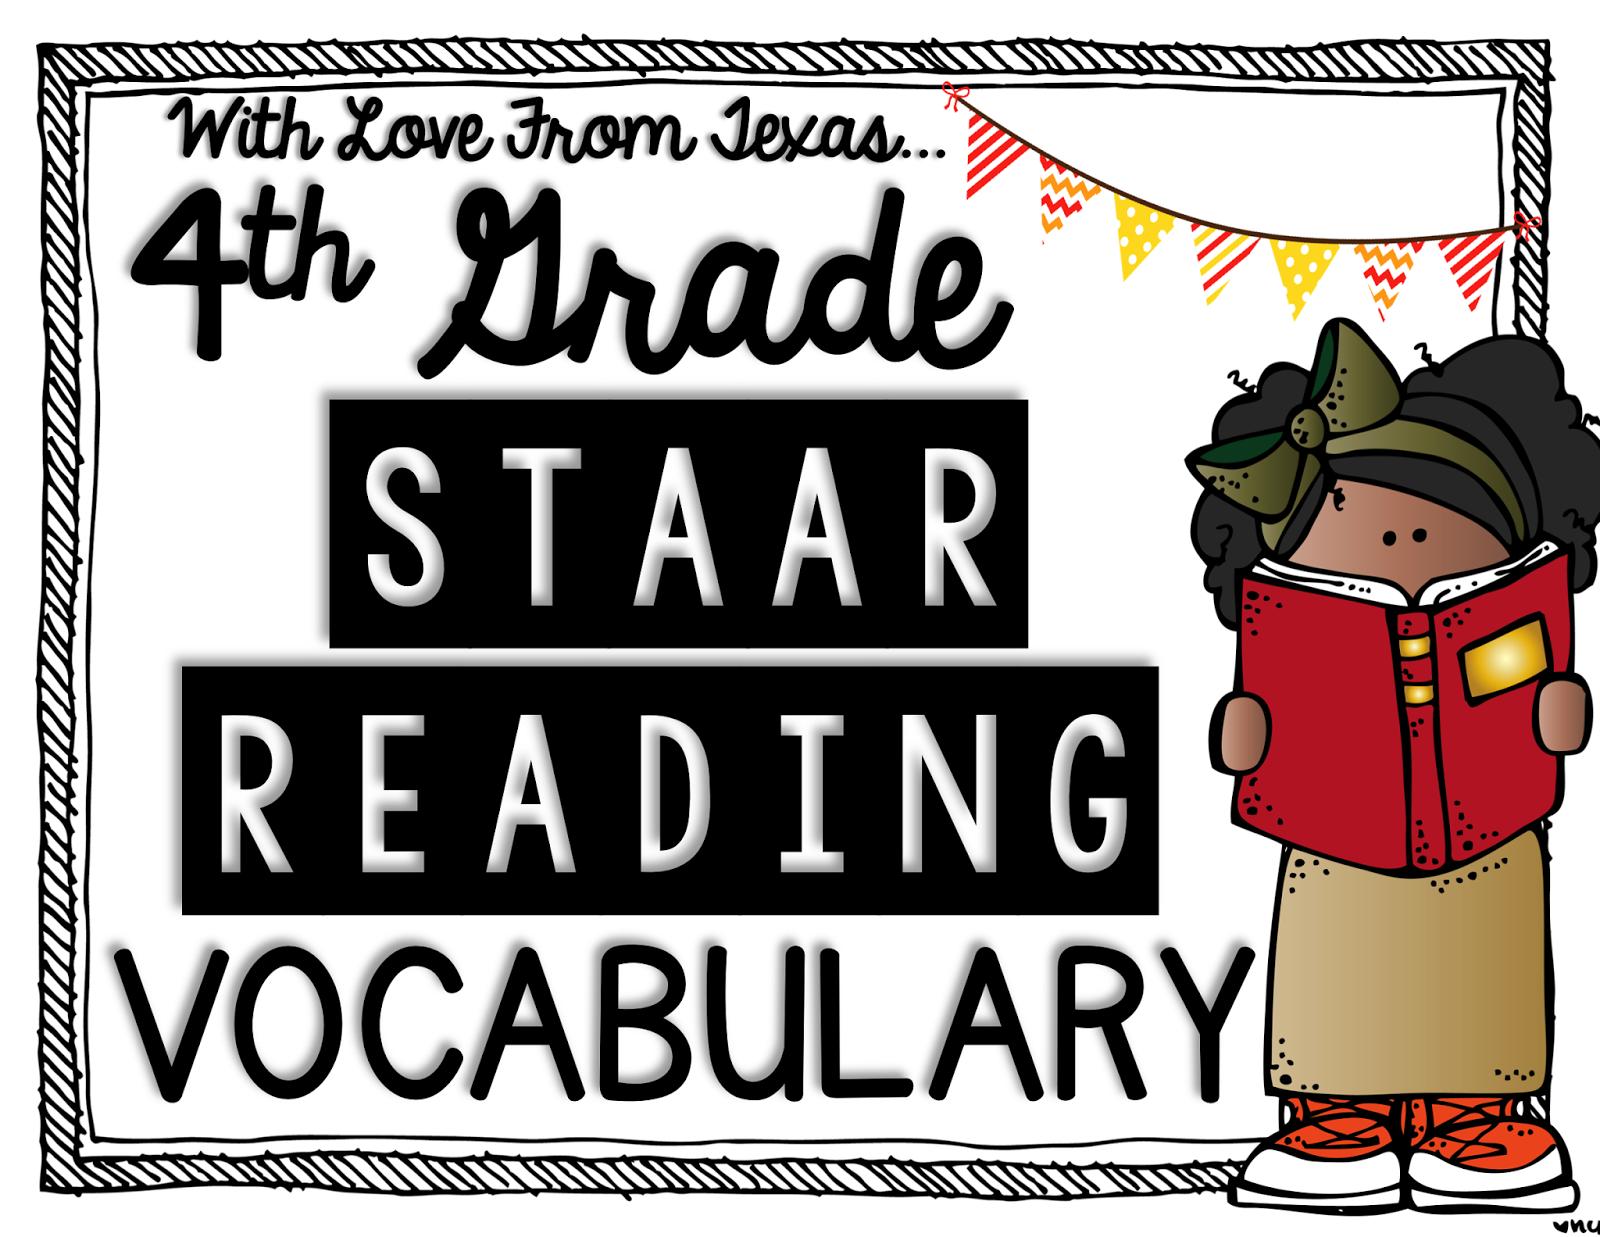 Reading STAAR Vocabulary. 4th grade reading vocabulary.